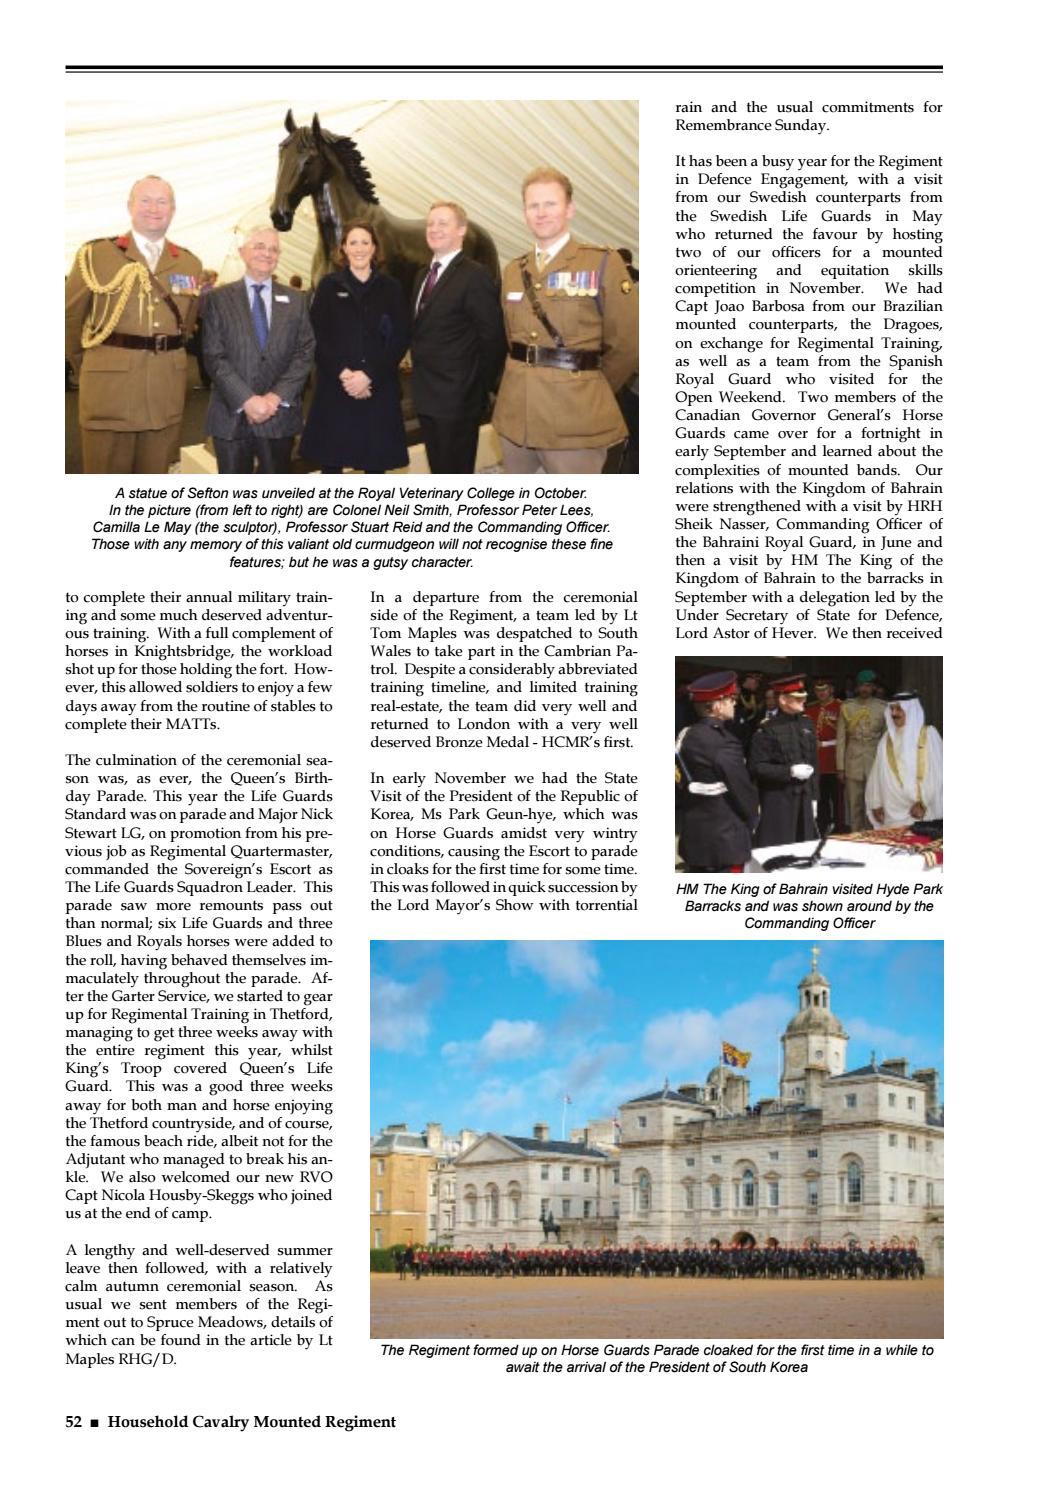 Household Cavalry Journal 2013 by RHG/D Reg Sec - issuu